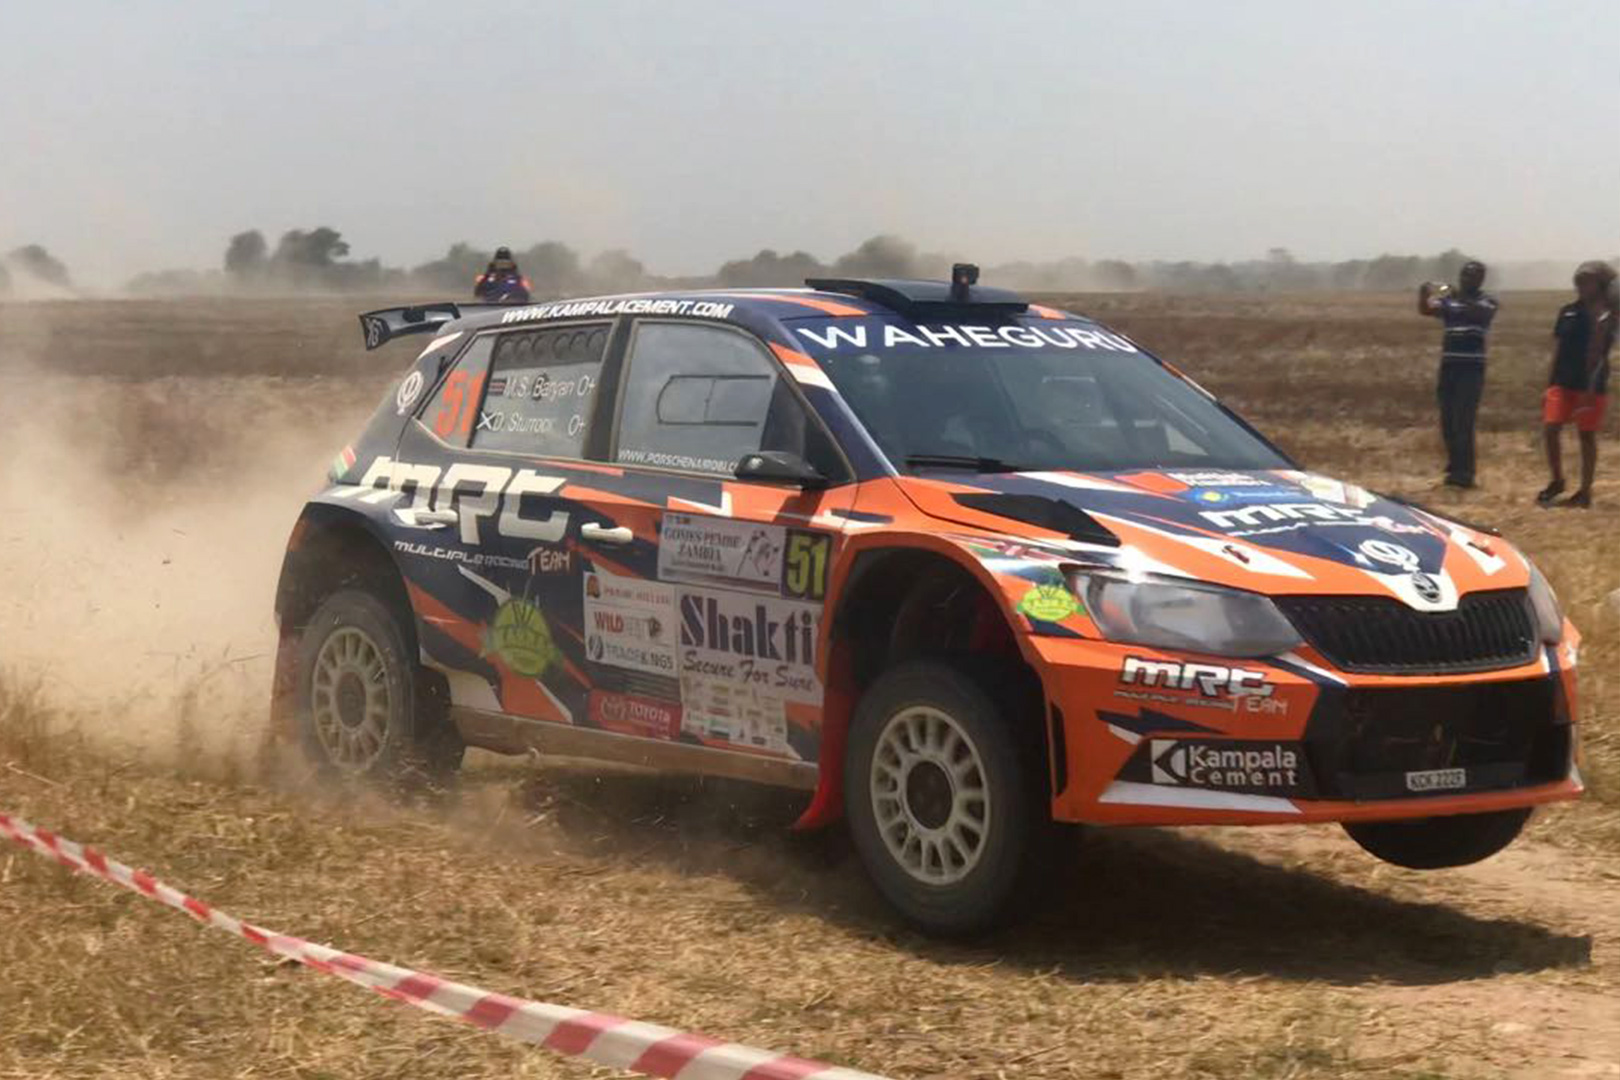 Manvir Singh Baryan / Drew Sturrock, ŠKODA FABIA R5, Multiple Racing Team. Zambia International Rally 2017